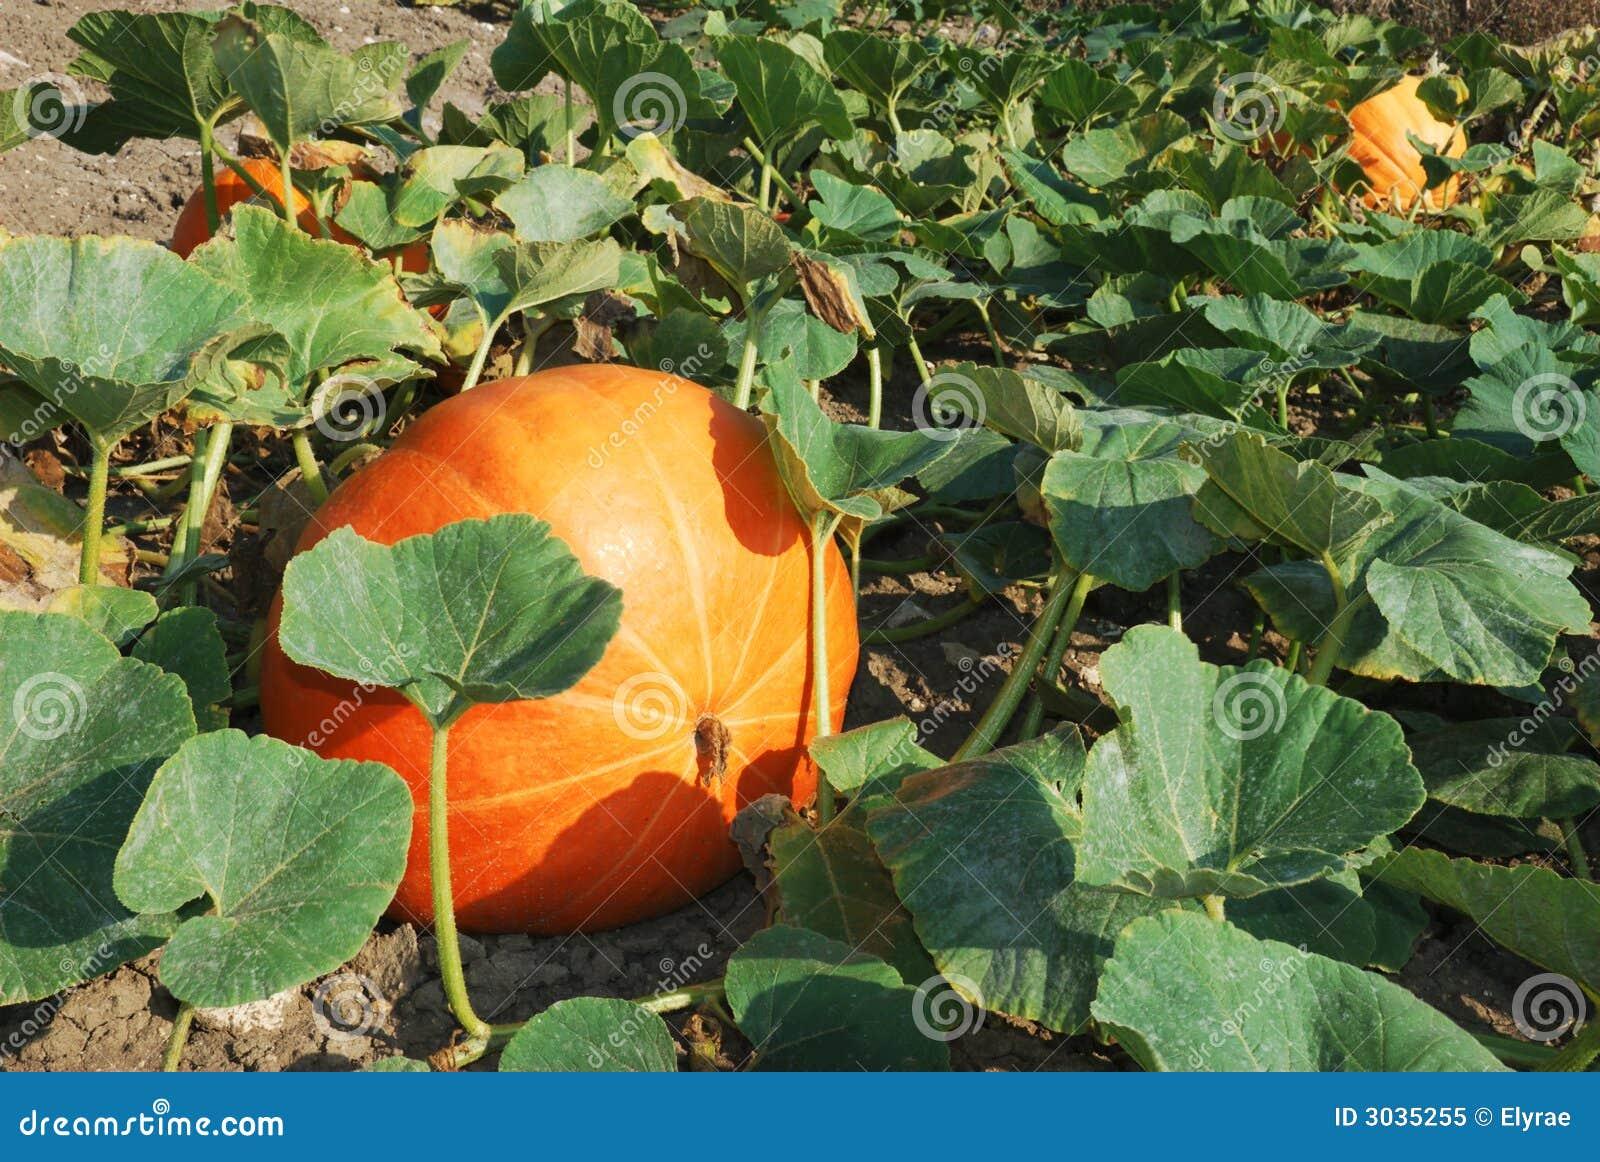 Pianta Di Zucca Di Halloween.Pumpkin Plants Stock Image Image Of Cultivation Leaf 3035255